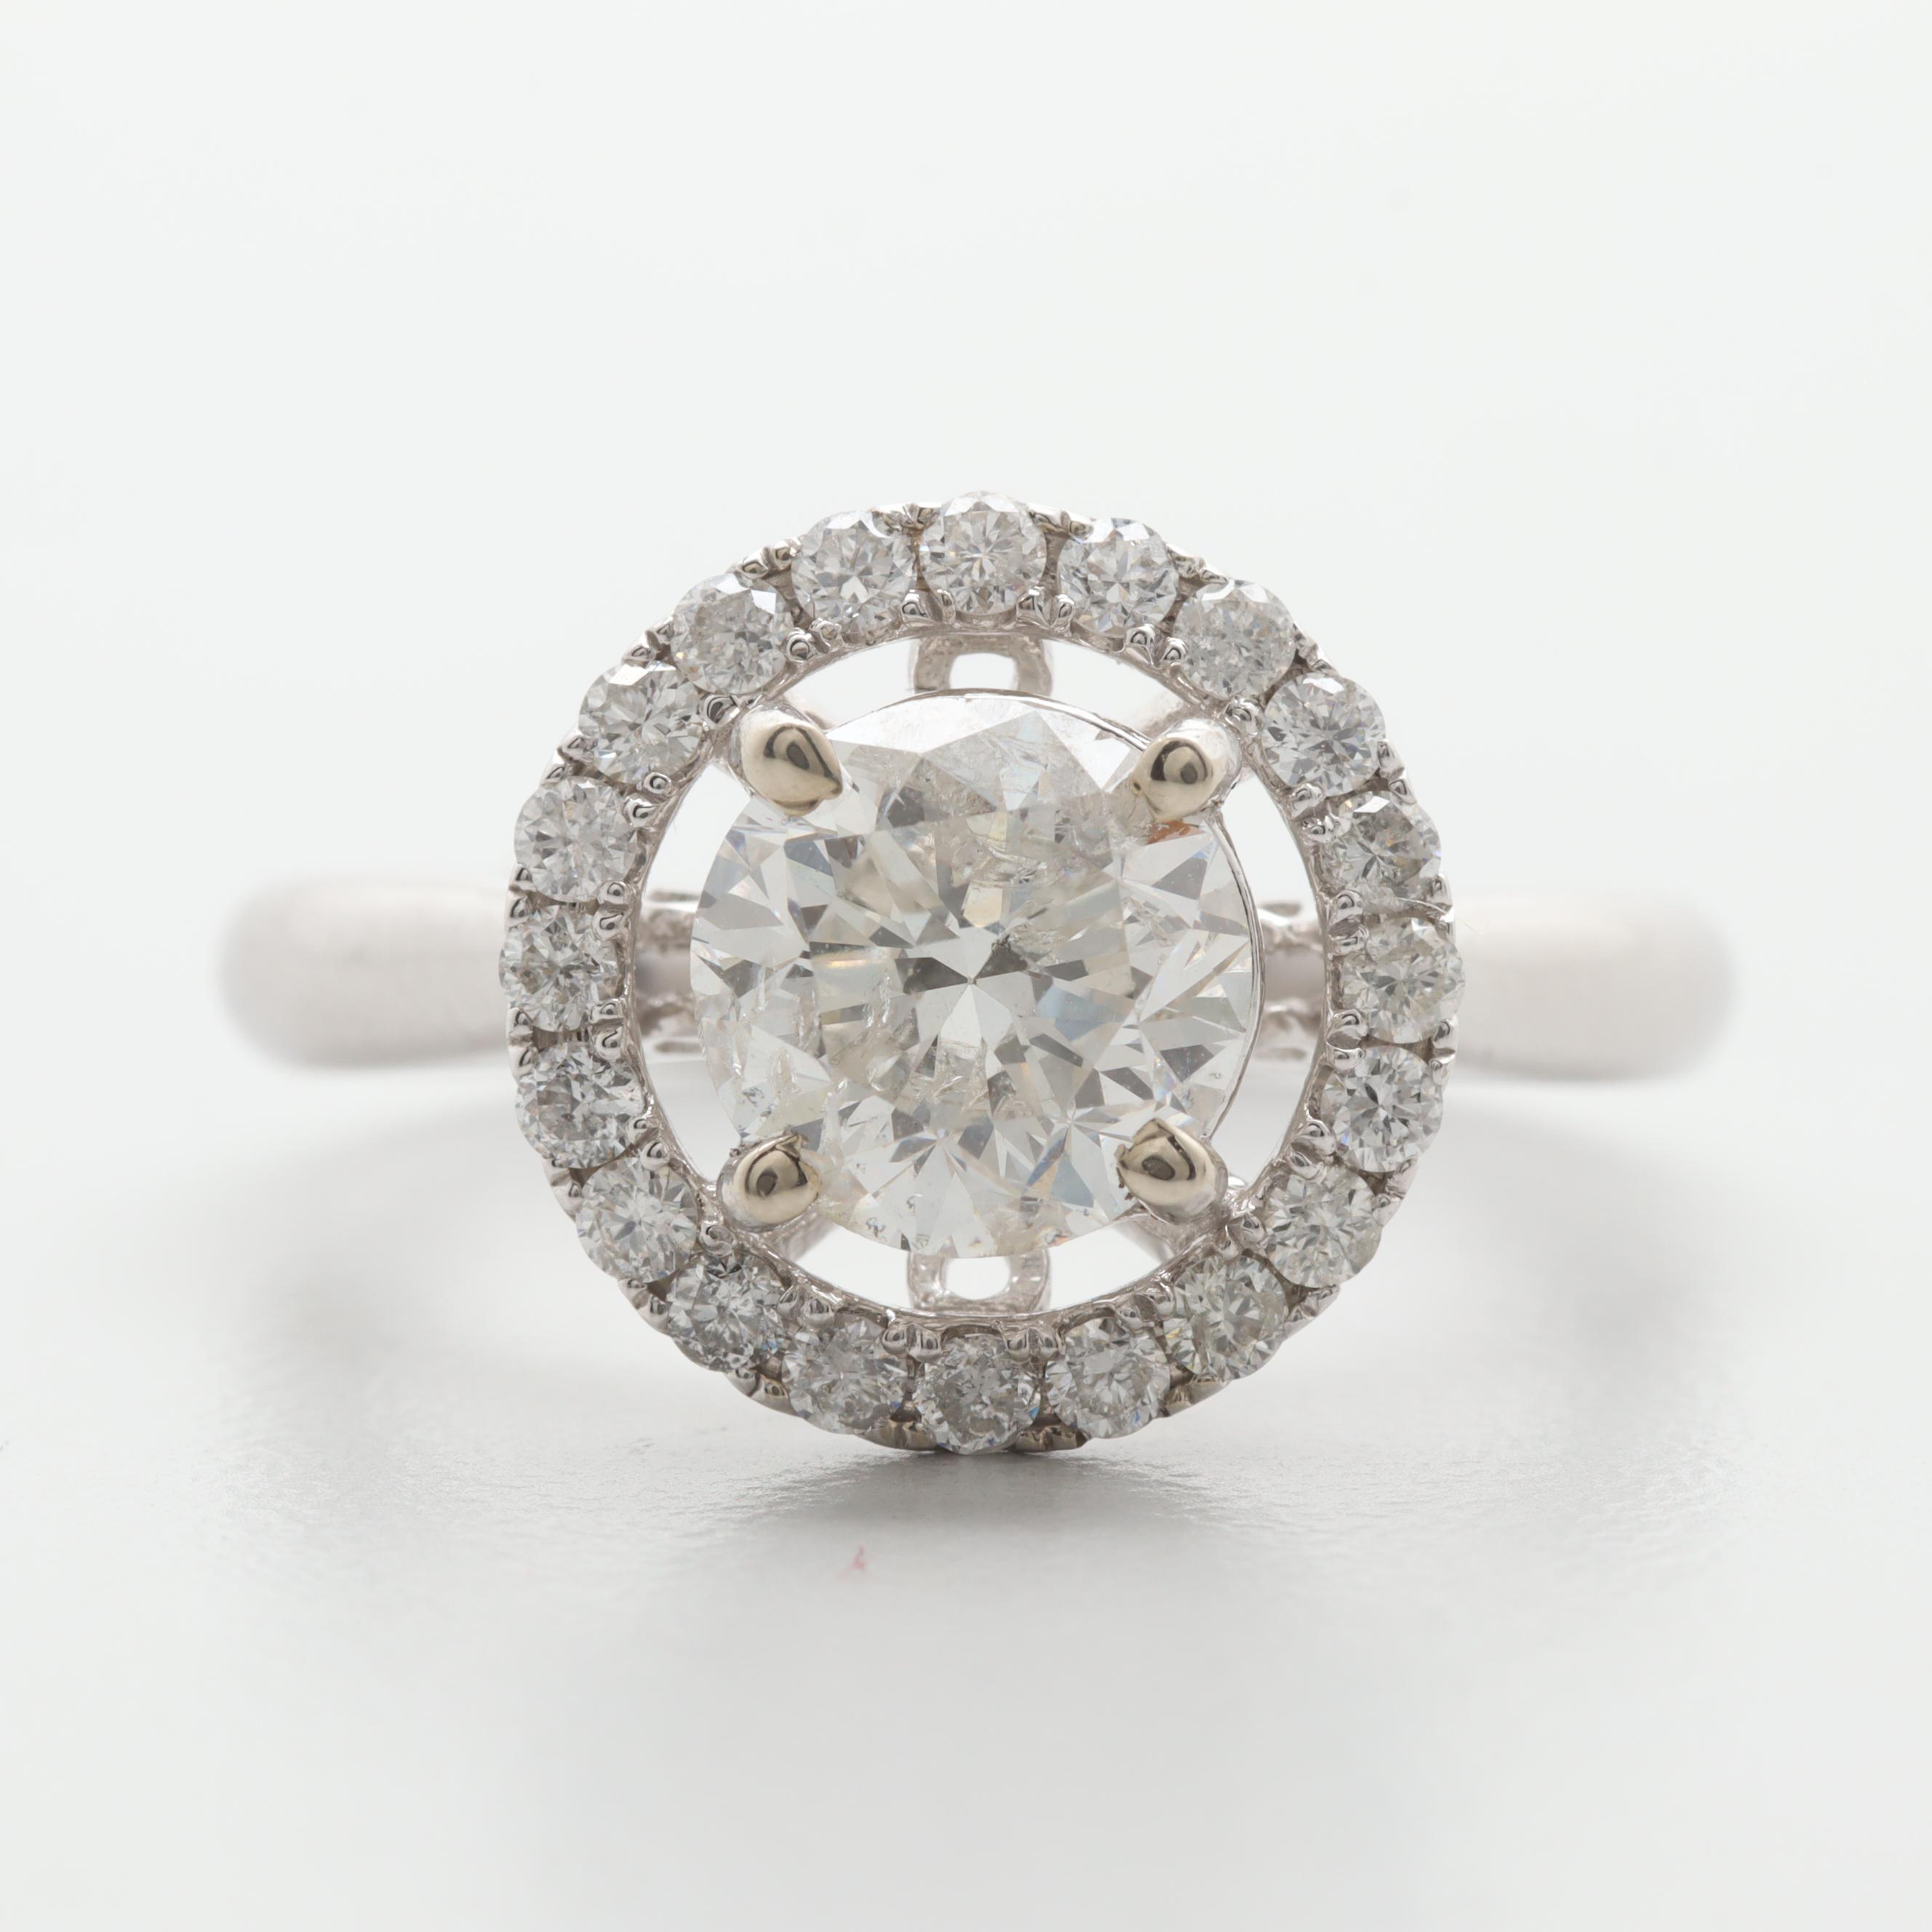 14K White Gold 1.87 CTW Diamond Ring